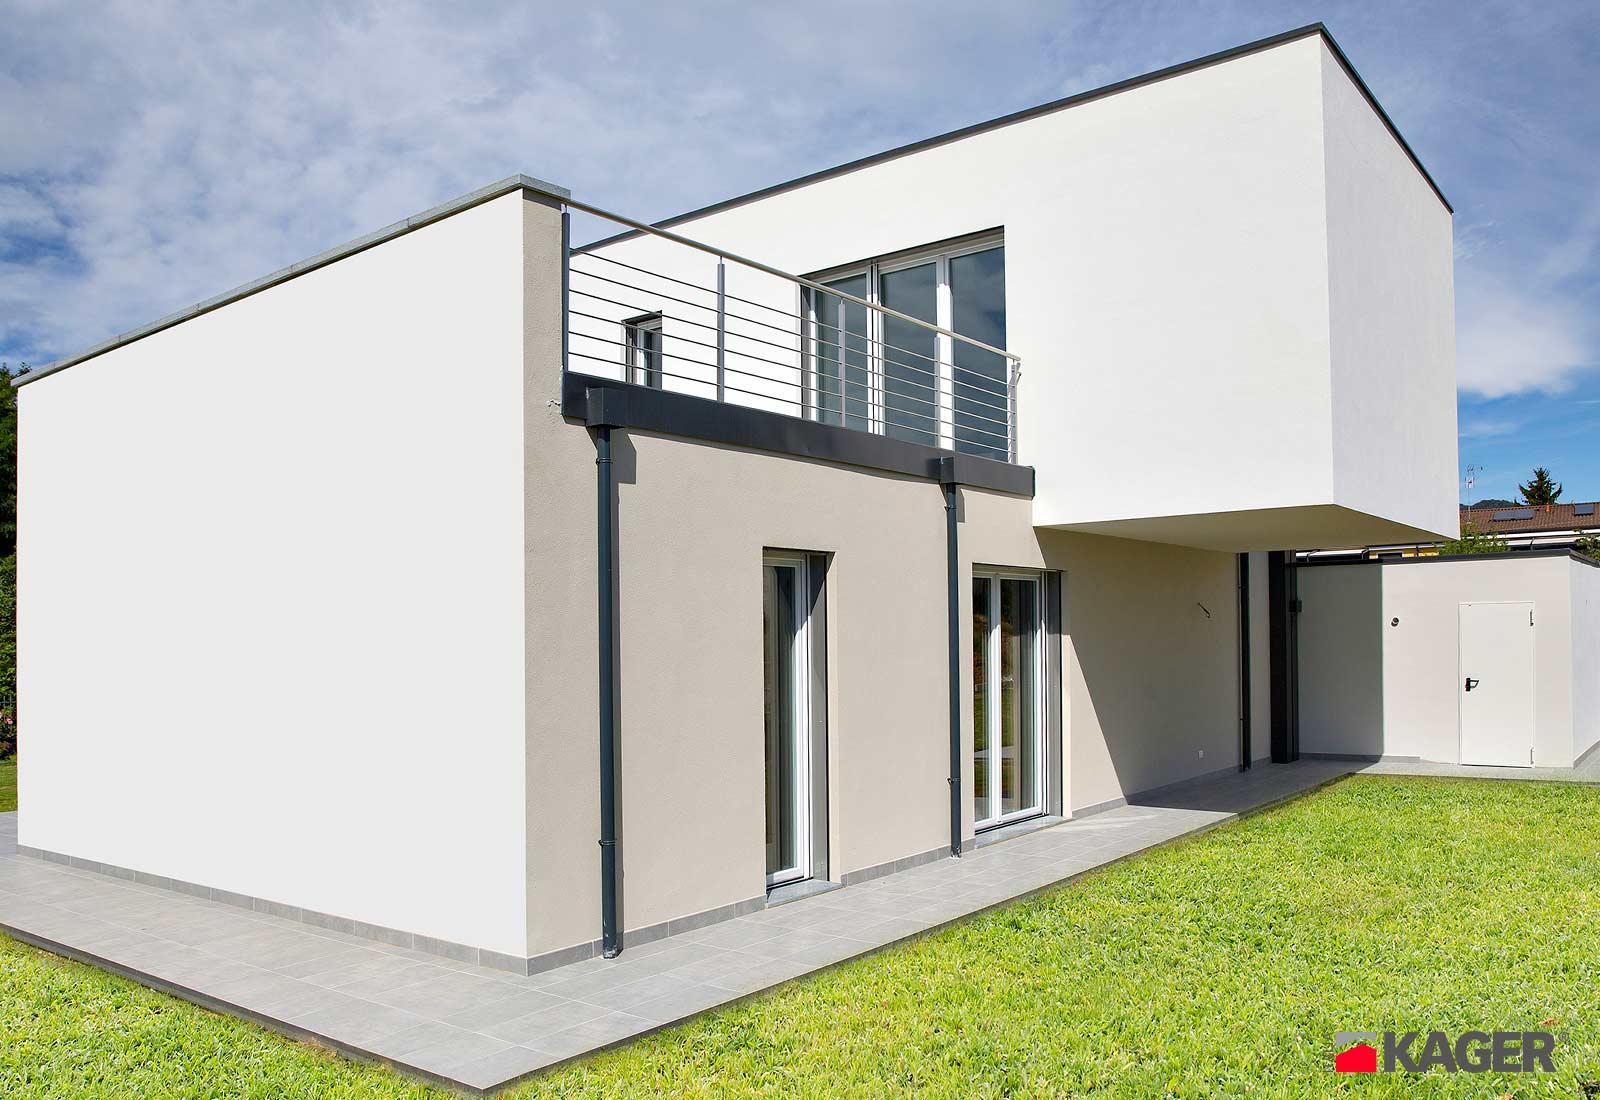 Casa-in-legno-Boca-Novara-Kager-Italia-07